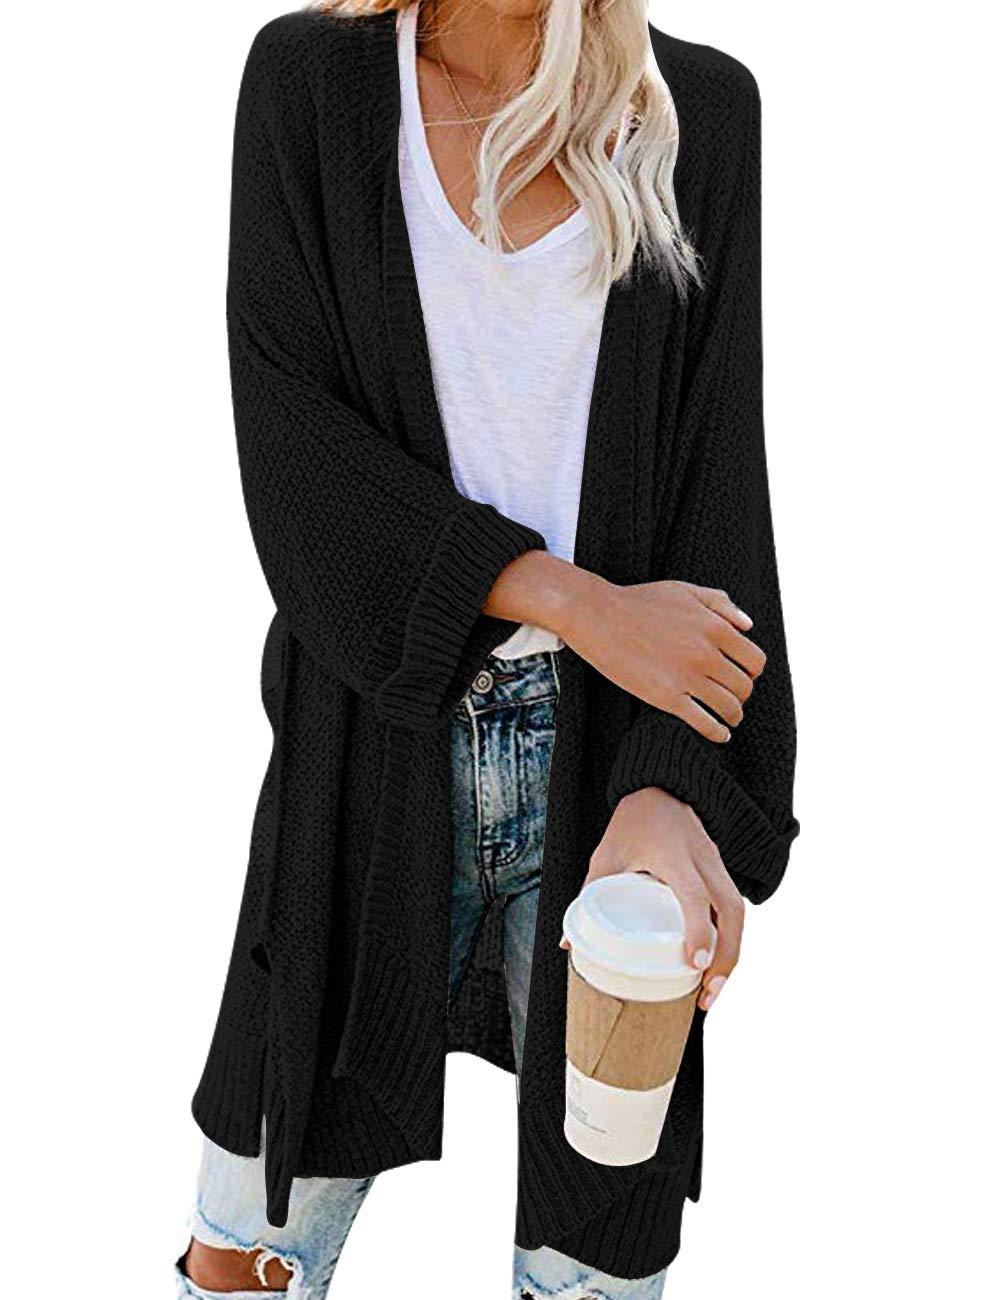 CPOKRTWSO Women's Plus Size Open Front 3/4 Sleeve Boho Boyfriend Knit Chunky Knit Cardigans Sweater Black S/M by CPOKRTWSO